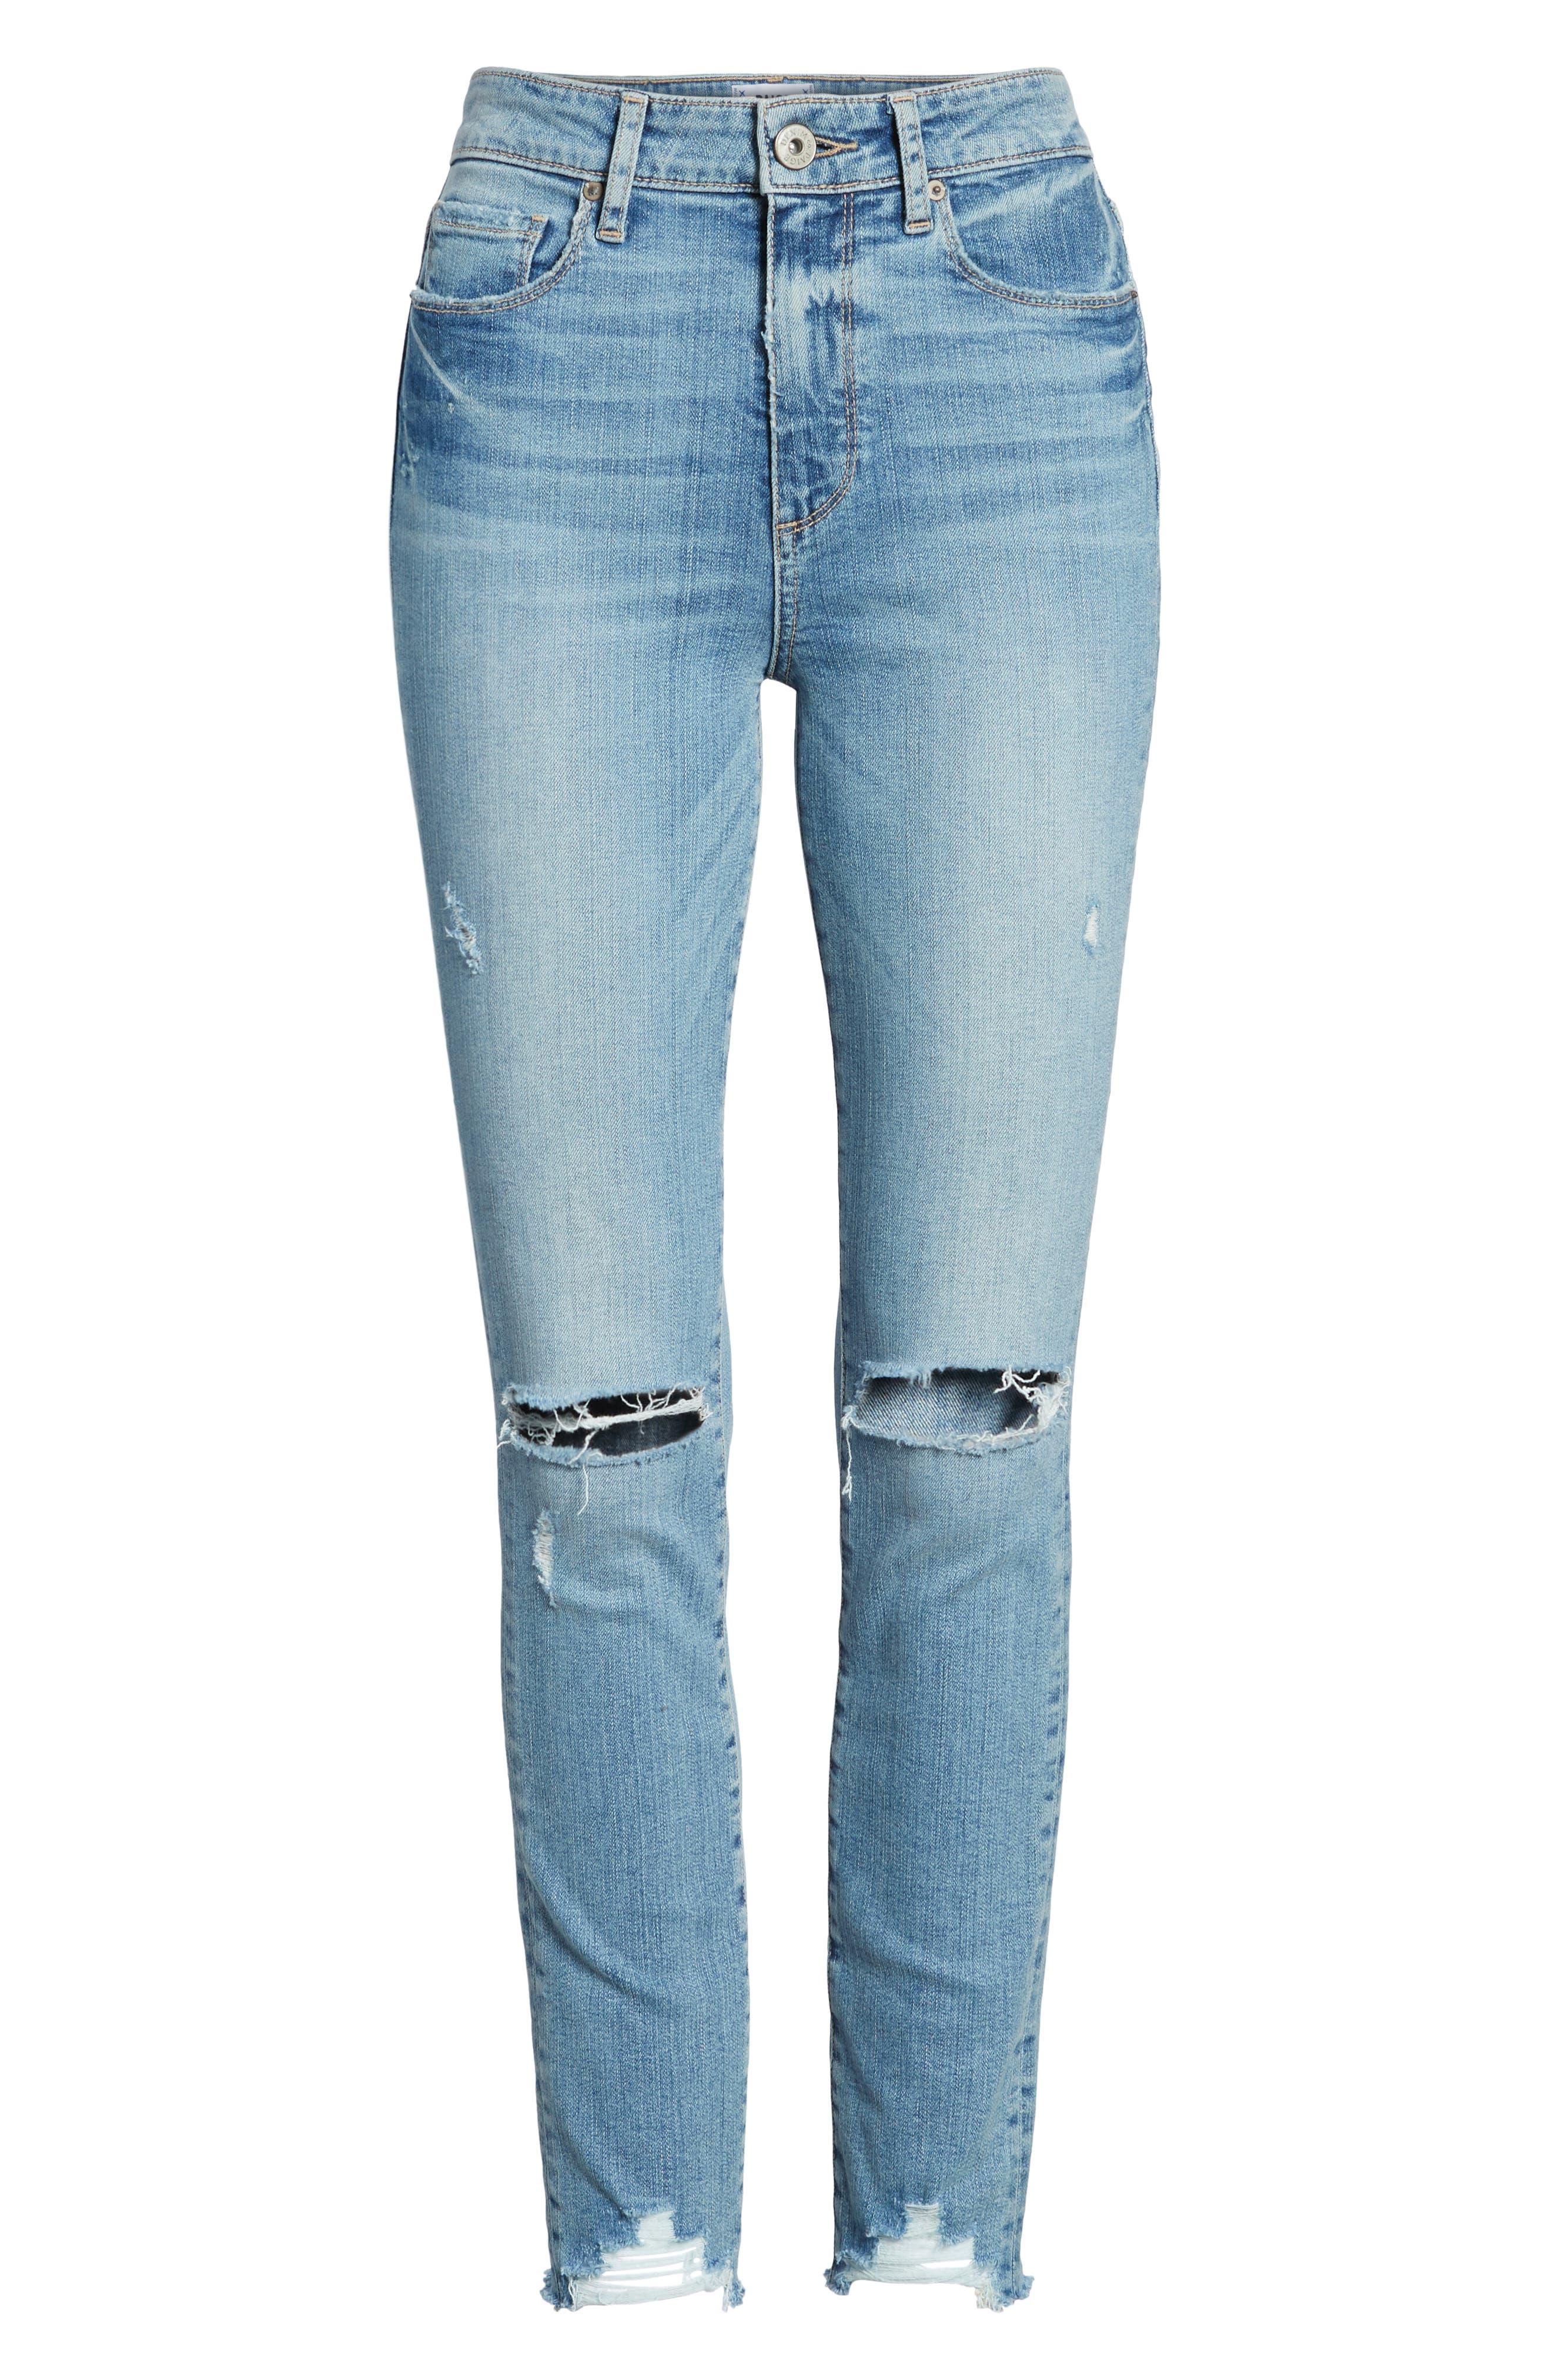 Hoxton High Waist Ankle Skinny Jeans,                             Alternate thumbnail 6, color,                             400